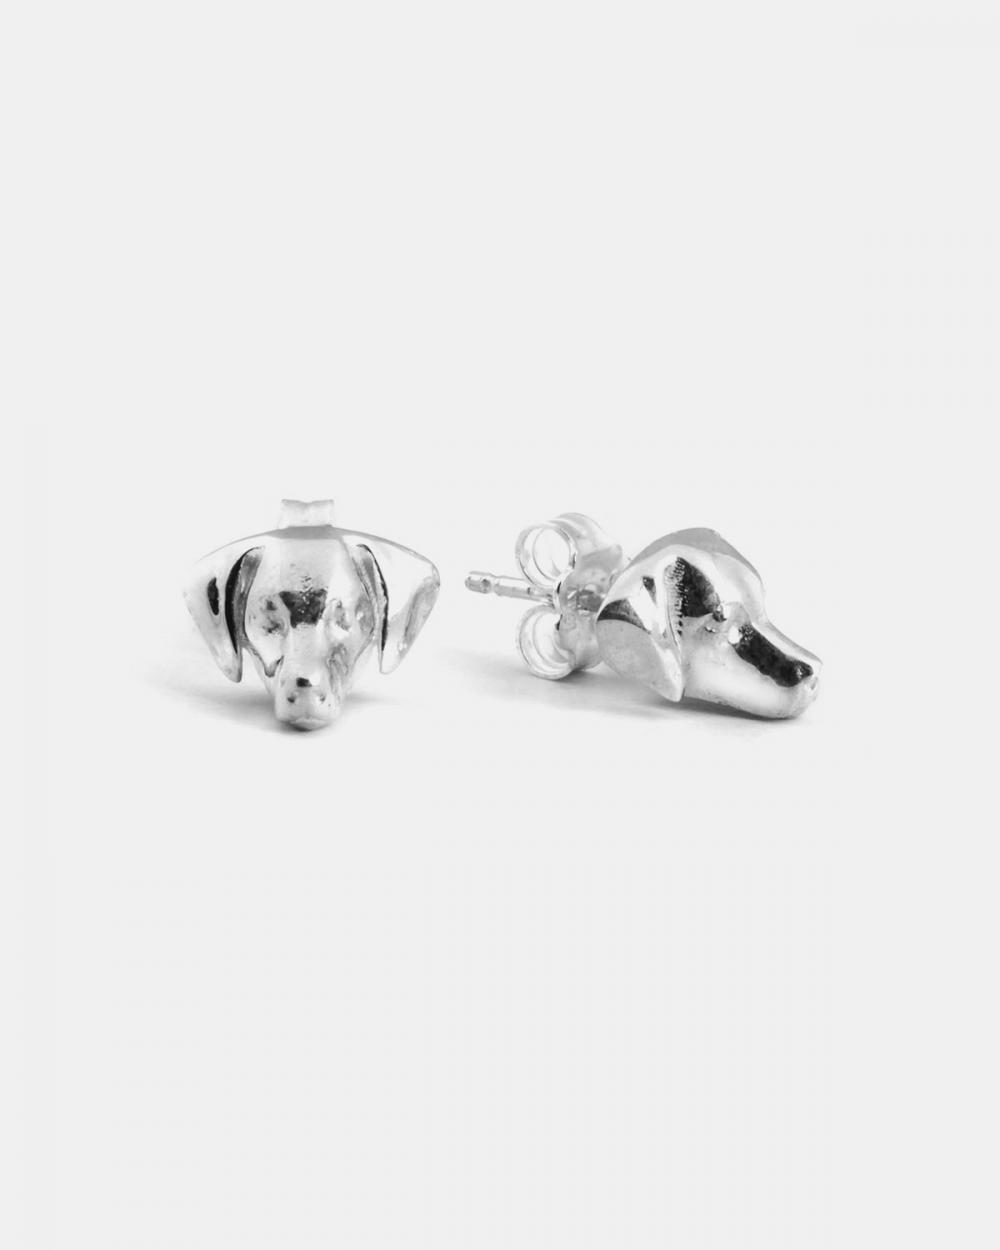 weimaraner couple earrings polished silver